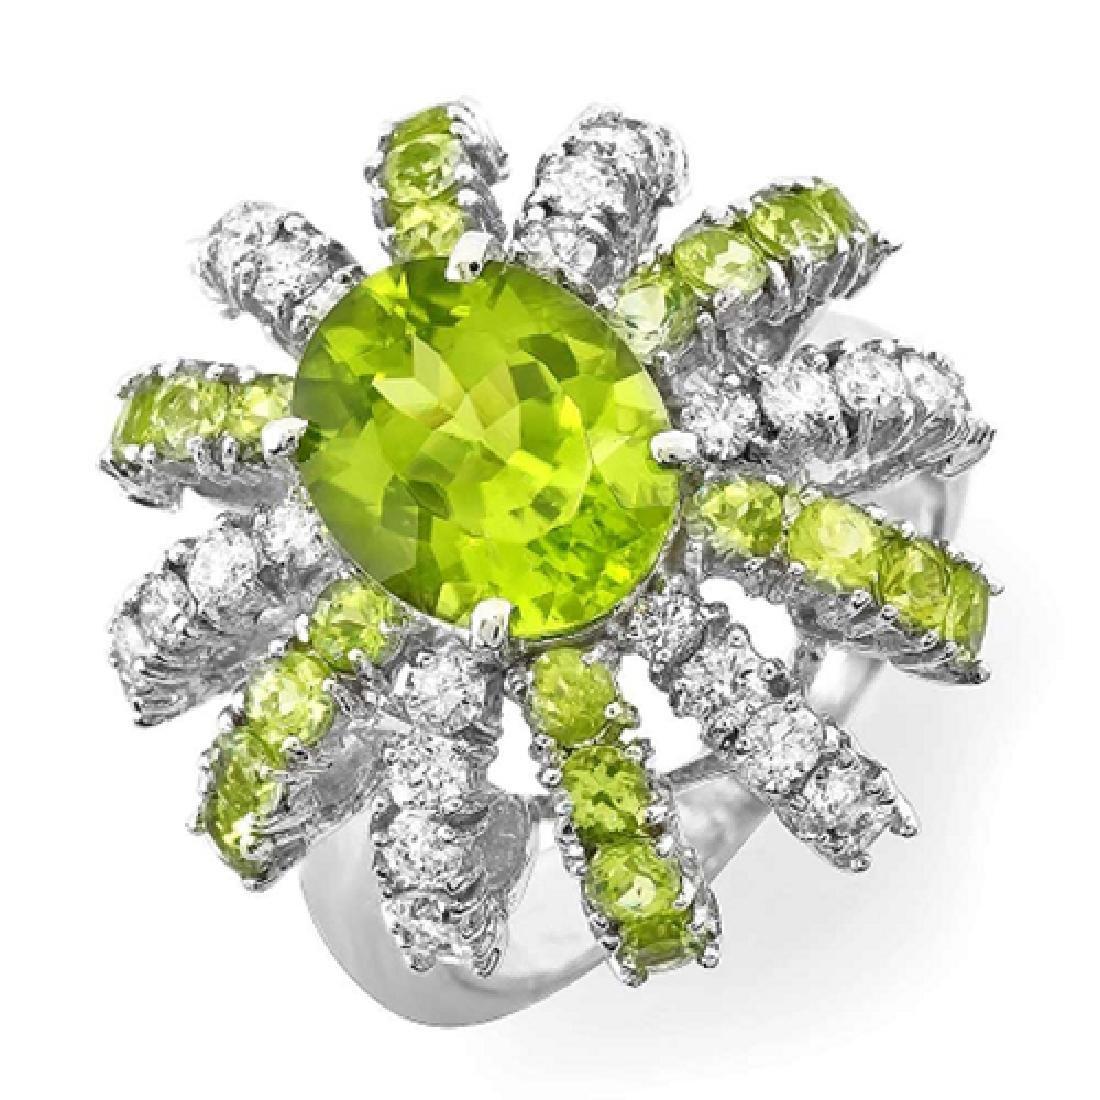 4.80 Carat Natural Peridot 18K Solid White Gold Diamond - 2